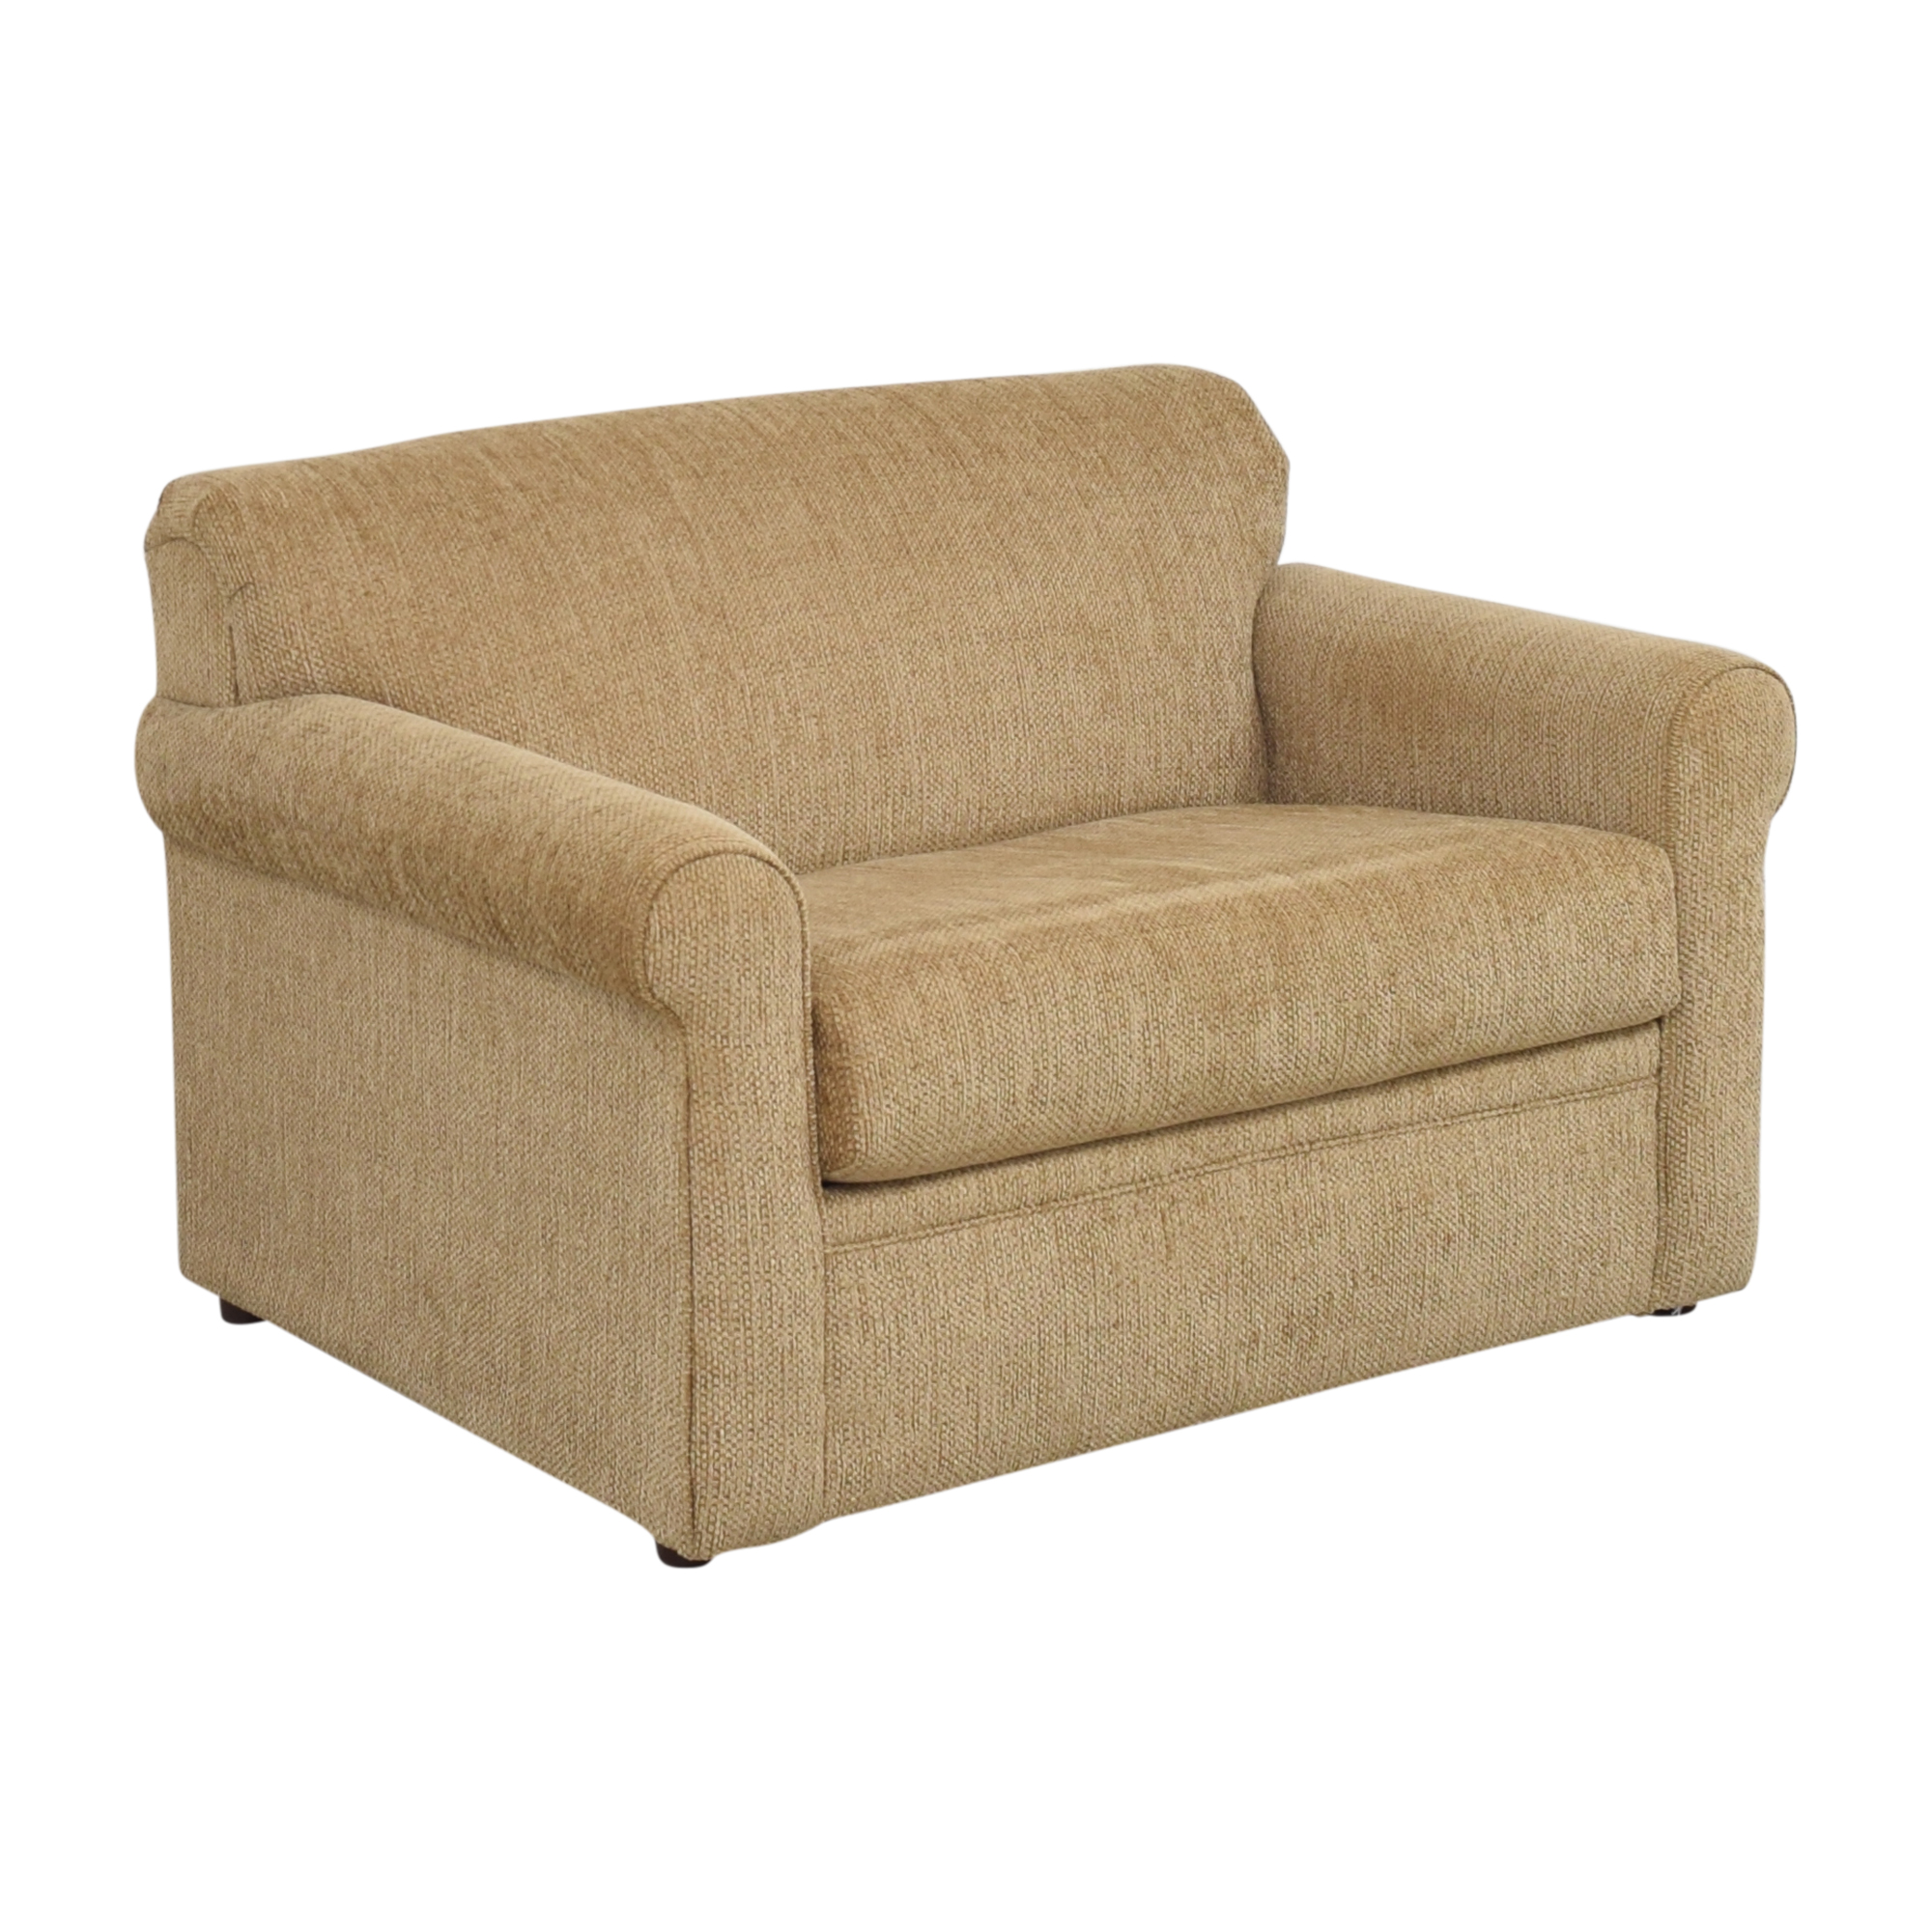 Overnight Sofa Overnight Sofa Sleeper Chair Sofa Beds